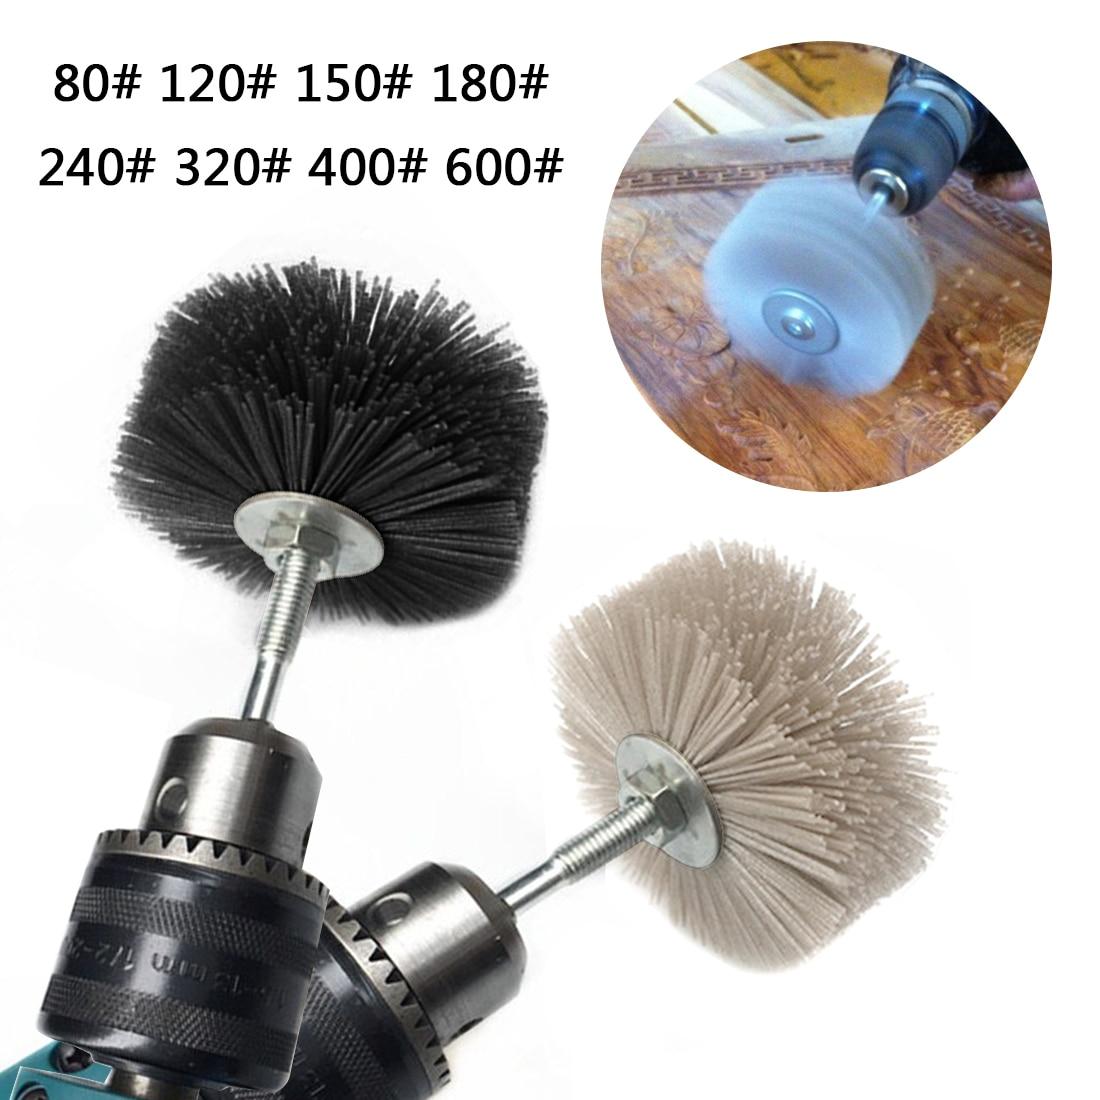 Abrasive Wire Grinding Flower Head Nylon Wheel Brush Woodwork Polishing Brush Bench Grinder for Grinding Tool Accessories